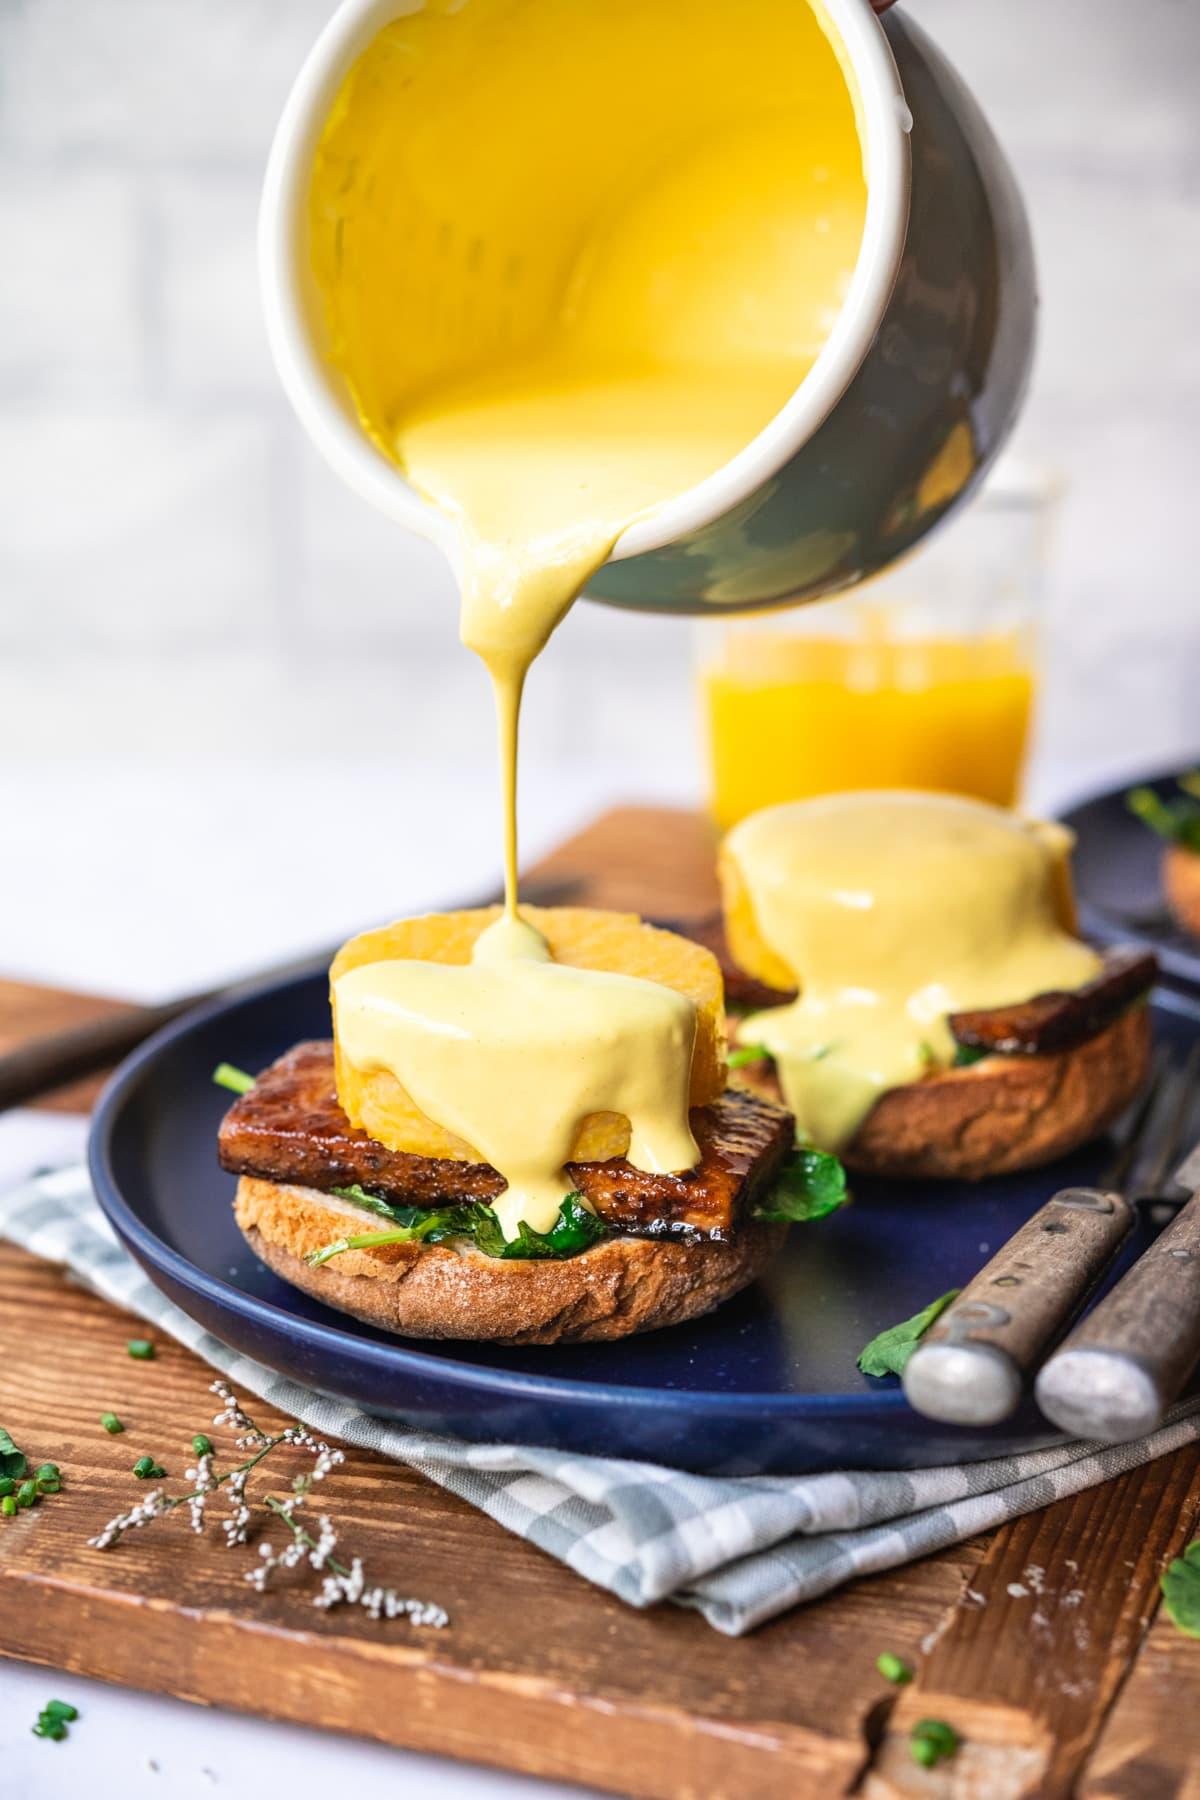 pouring vegan hollandaise sauce onto polenta eggs benedict on blue plate.